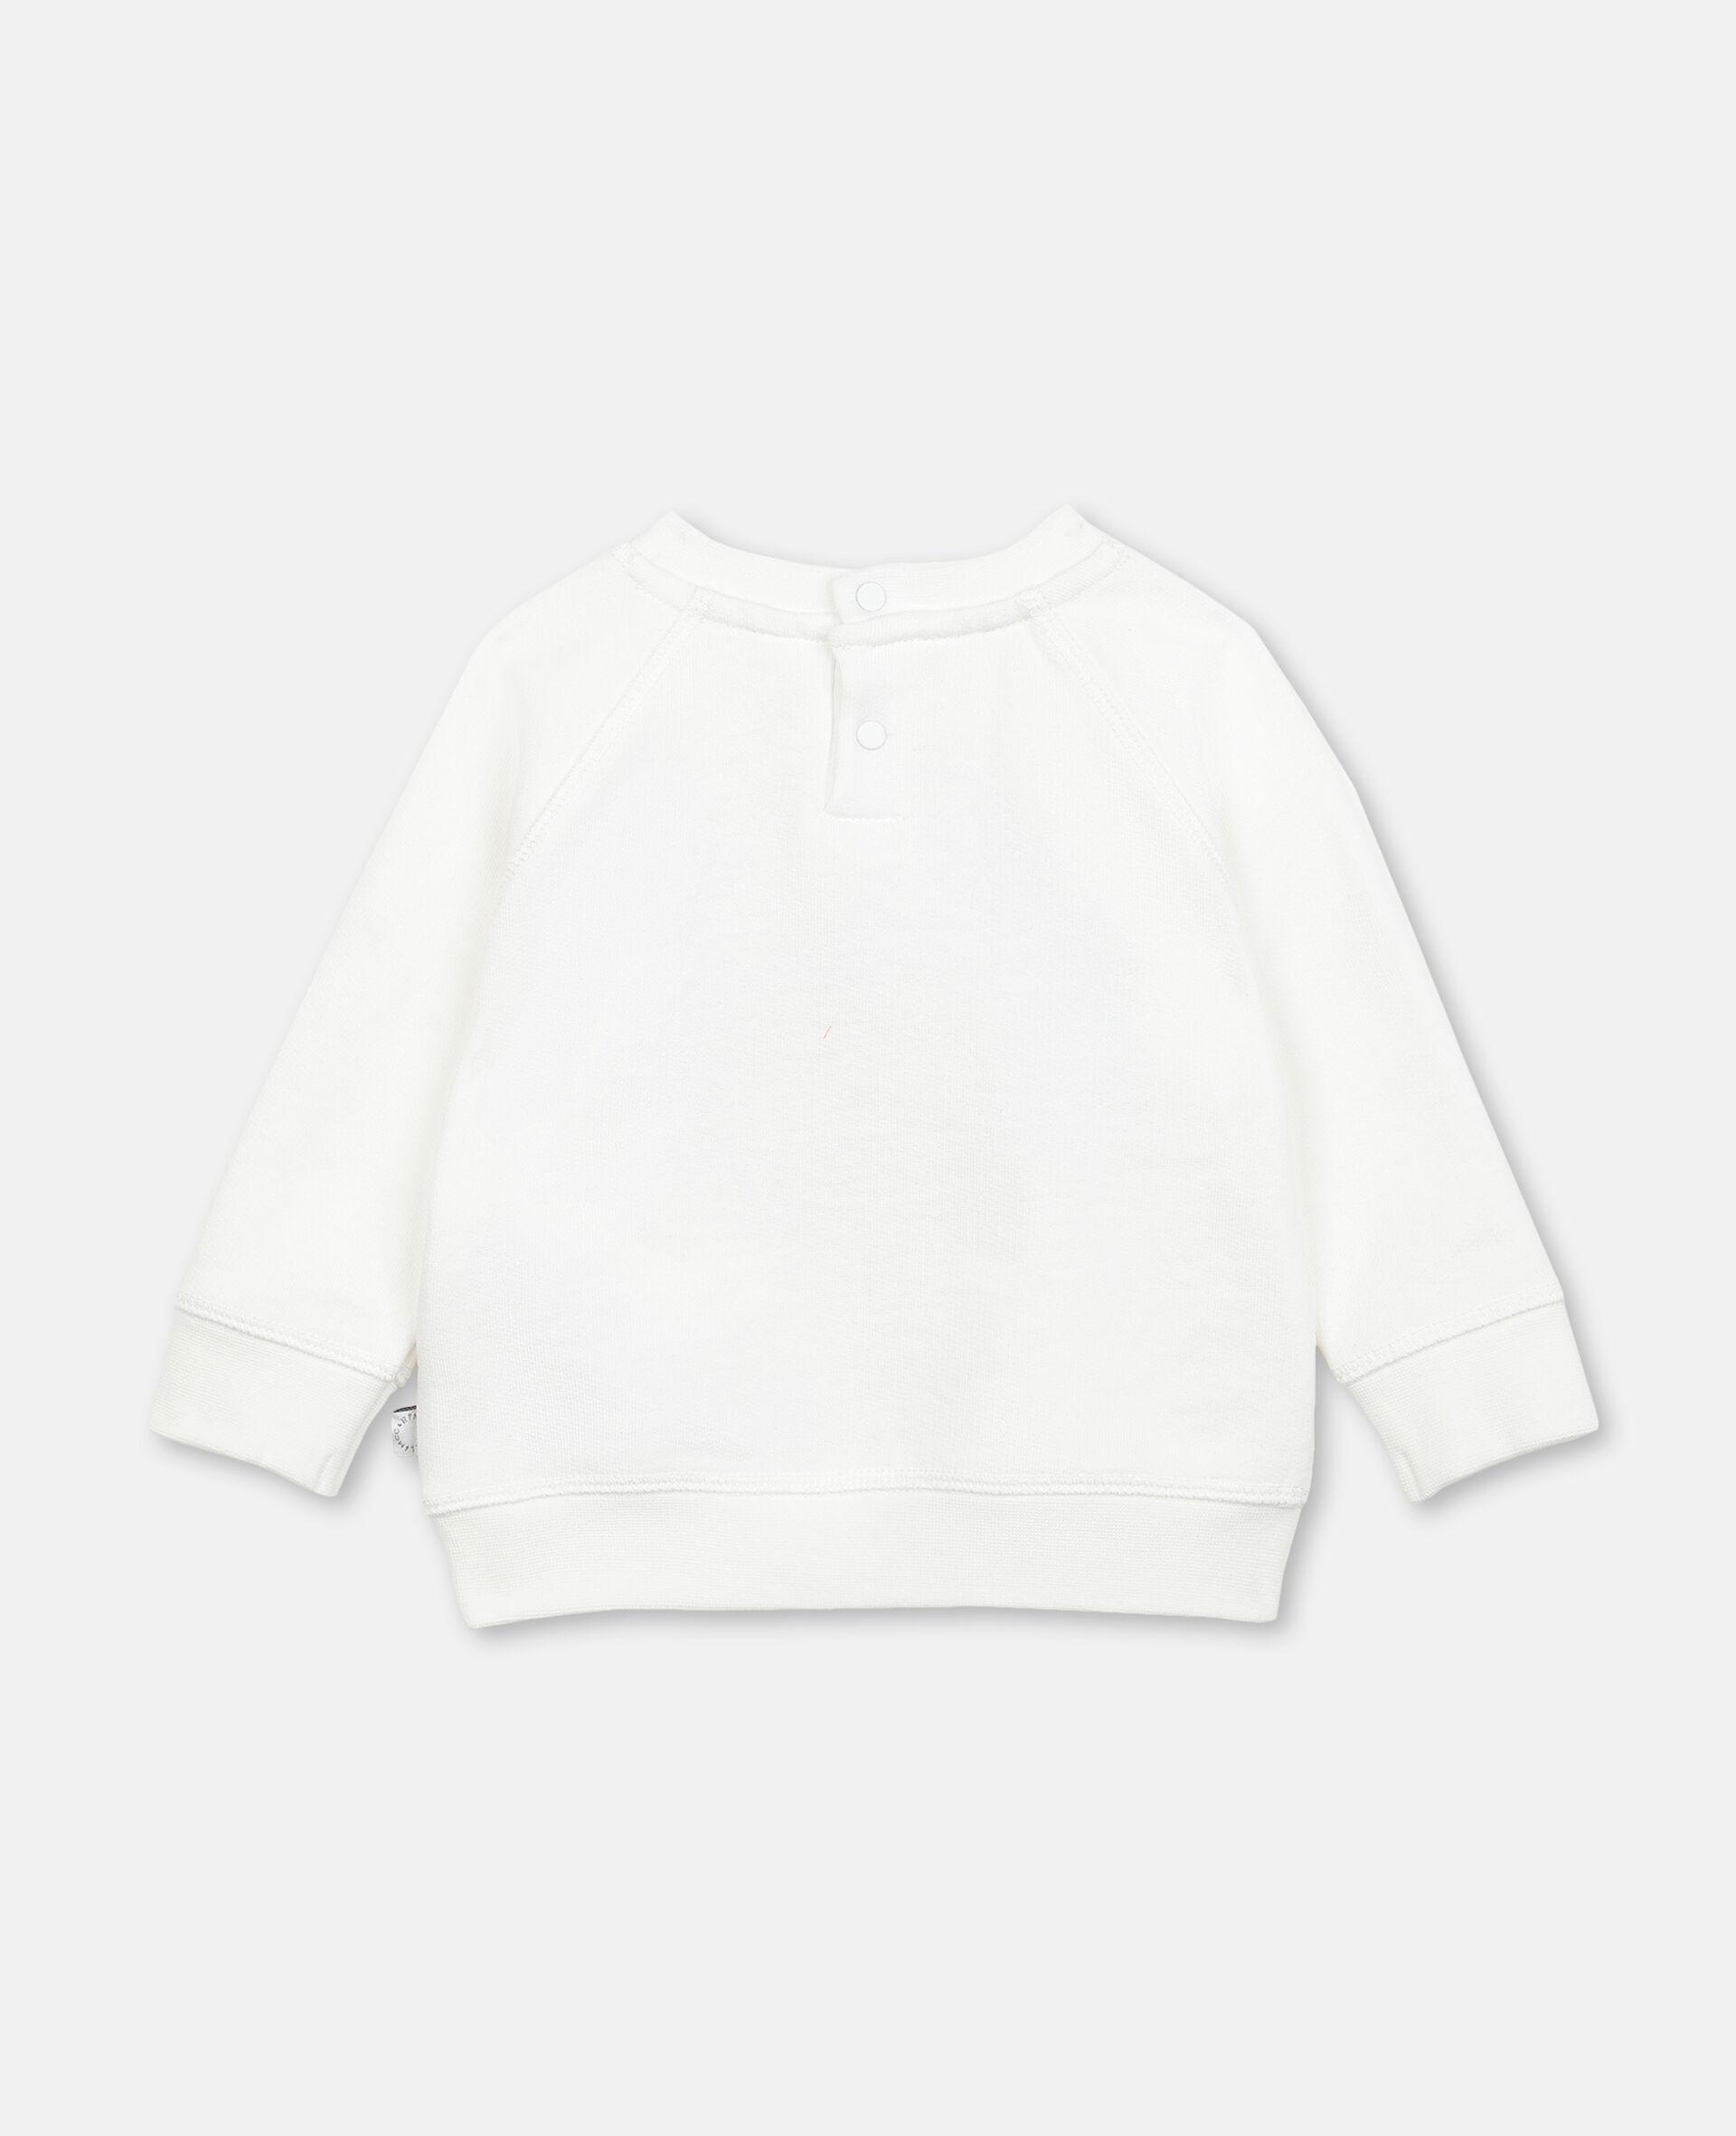 Butterfly Fleece Sweatshirt-White-large image number 3